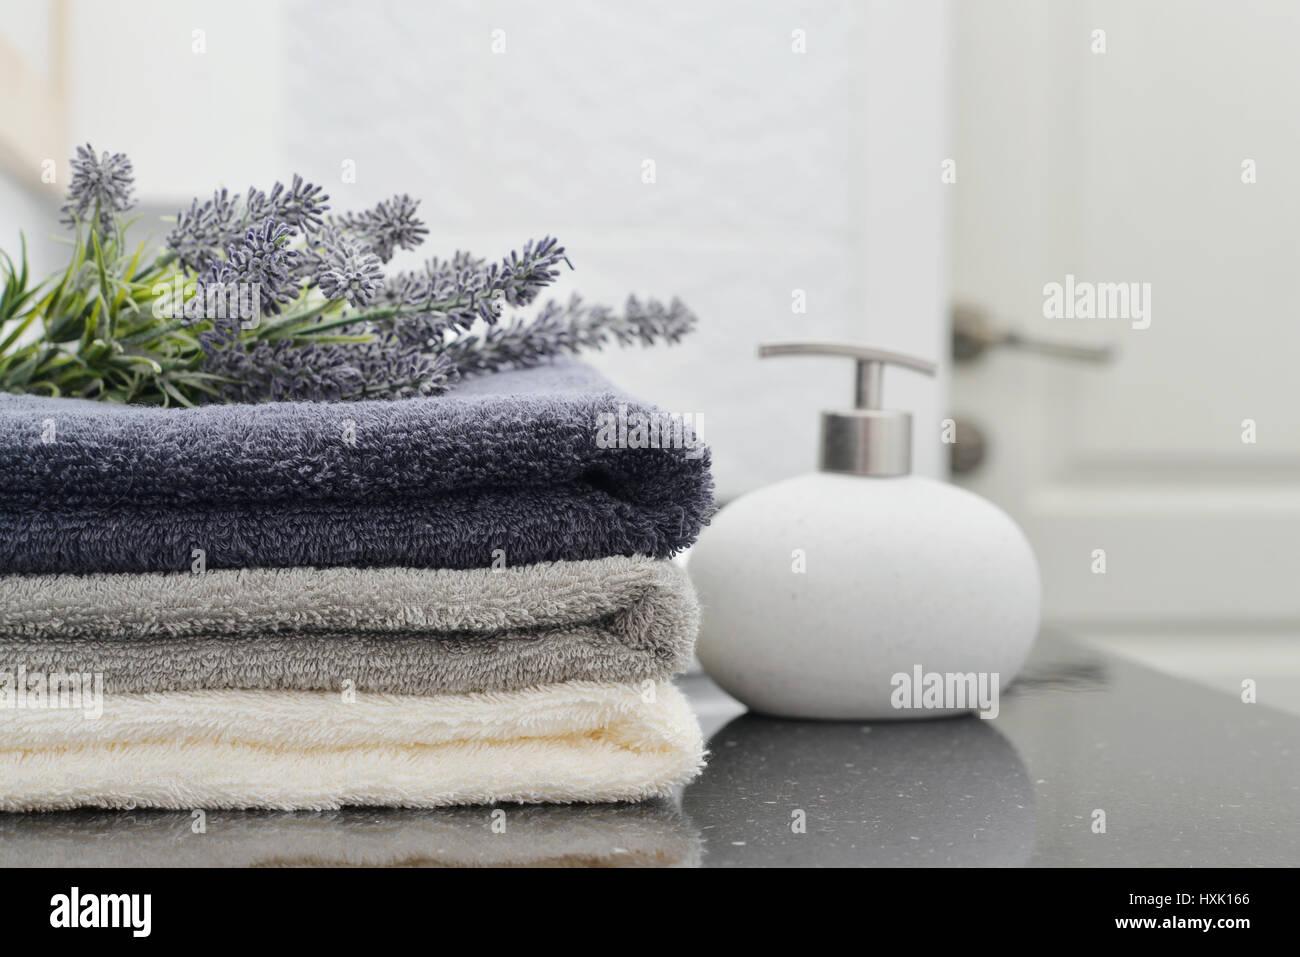 Laundry Folded Towels Stock Photos & Laundry Folded Towels Stock ...